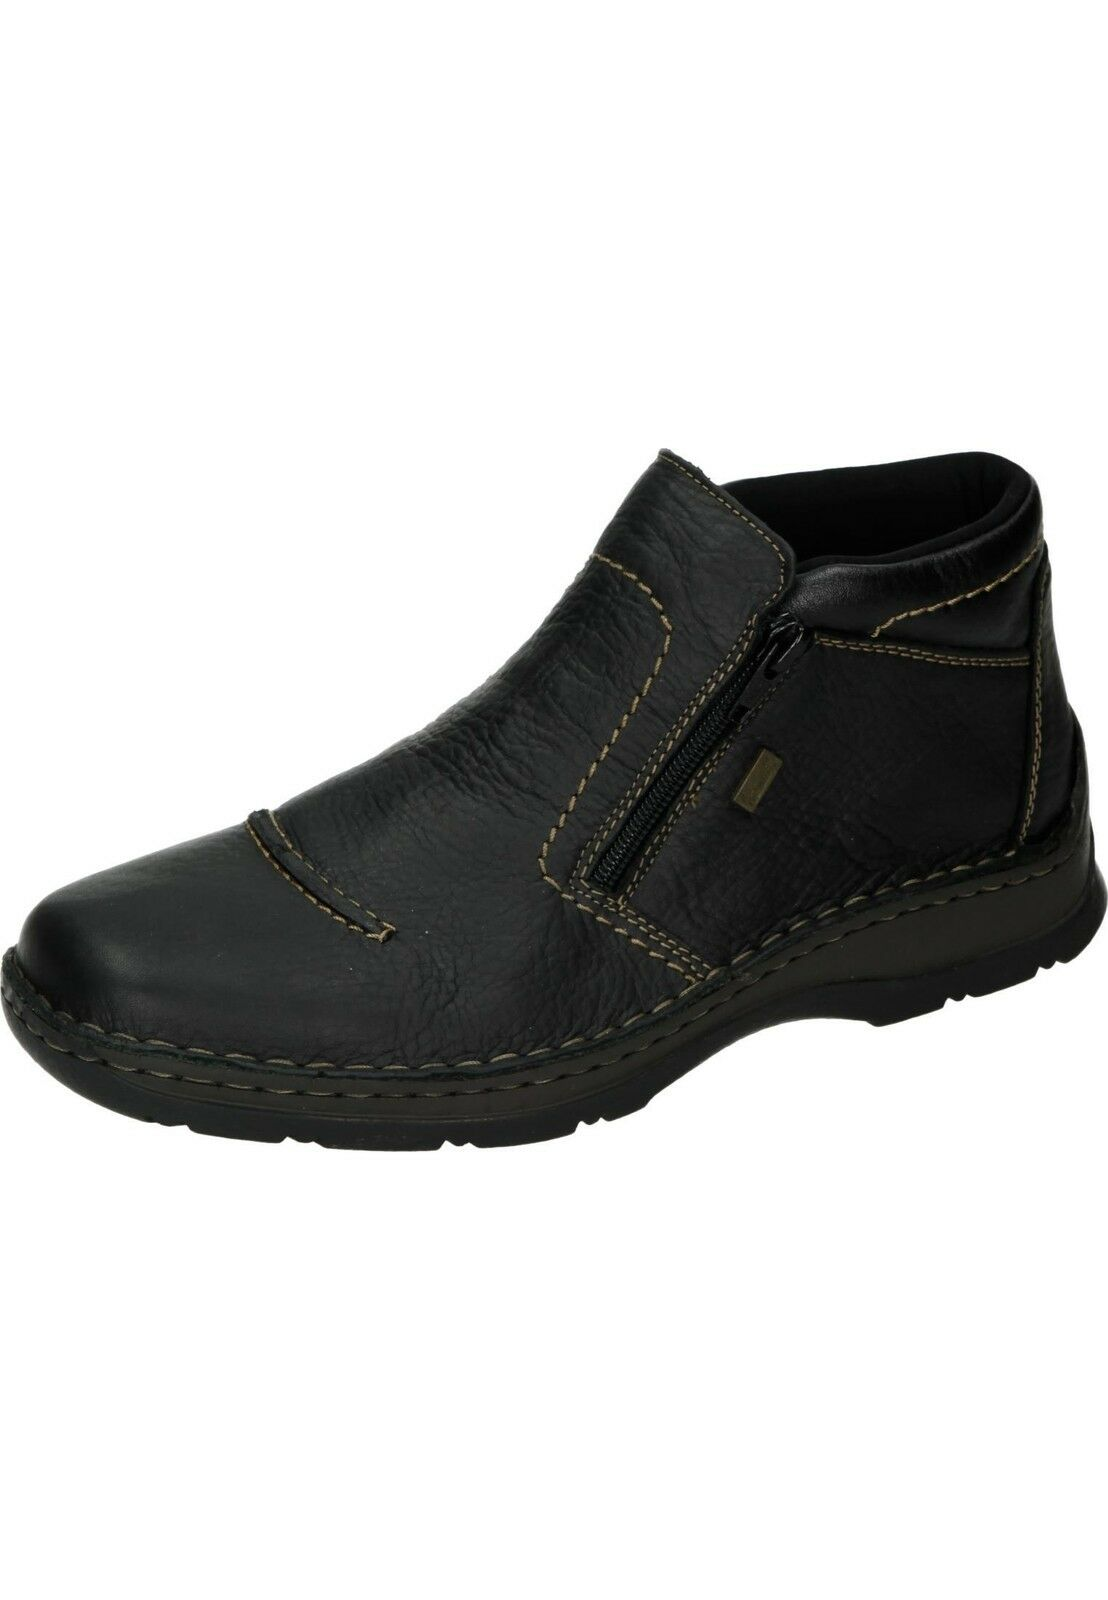 Rieker 5372 -00 stivali Winterscarpe Stiefletten stivali  nero Gr.40 -46 Neu4  vendita online risparmia il 70%